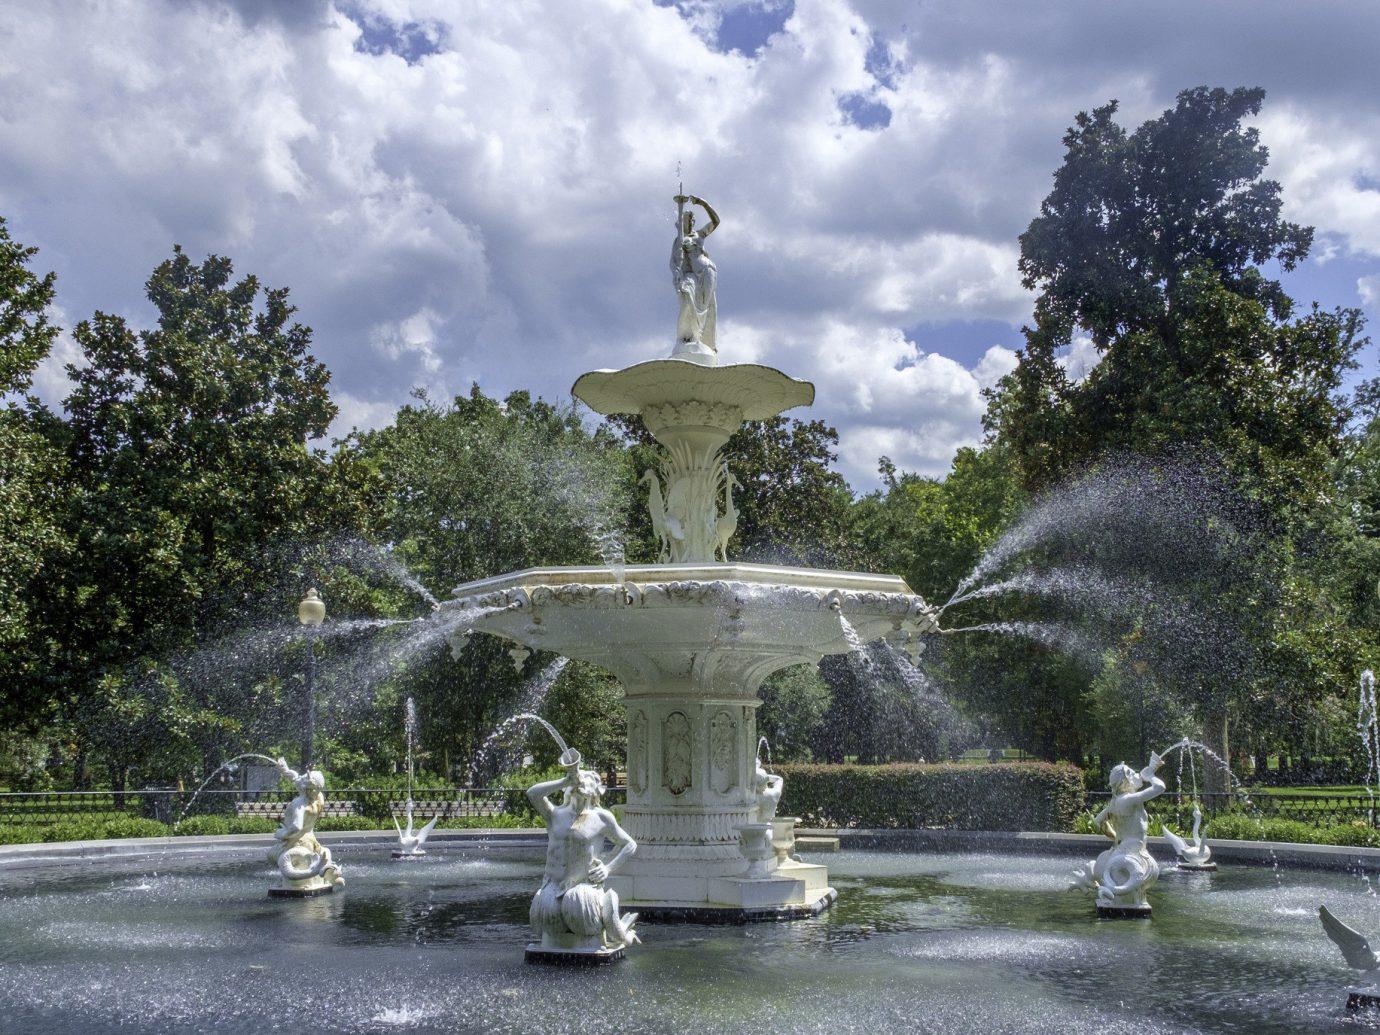 Romance Trip Ideas tree sky outdoor fountain landmark water feature water town square plaza monument Garden lighting memorial park